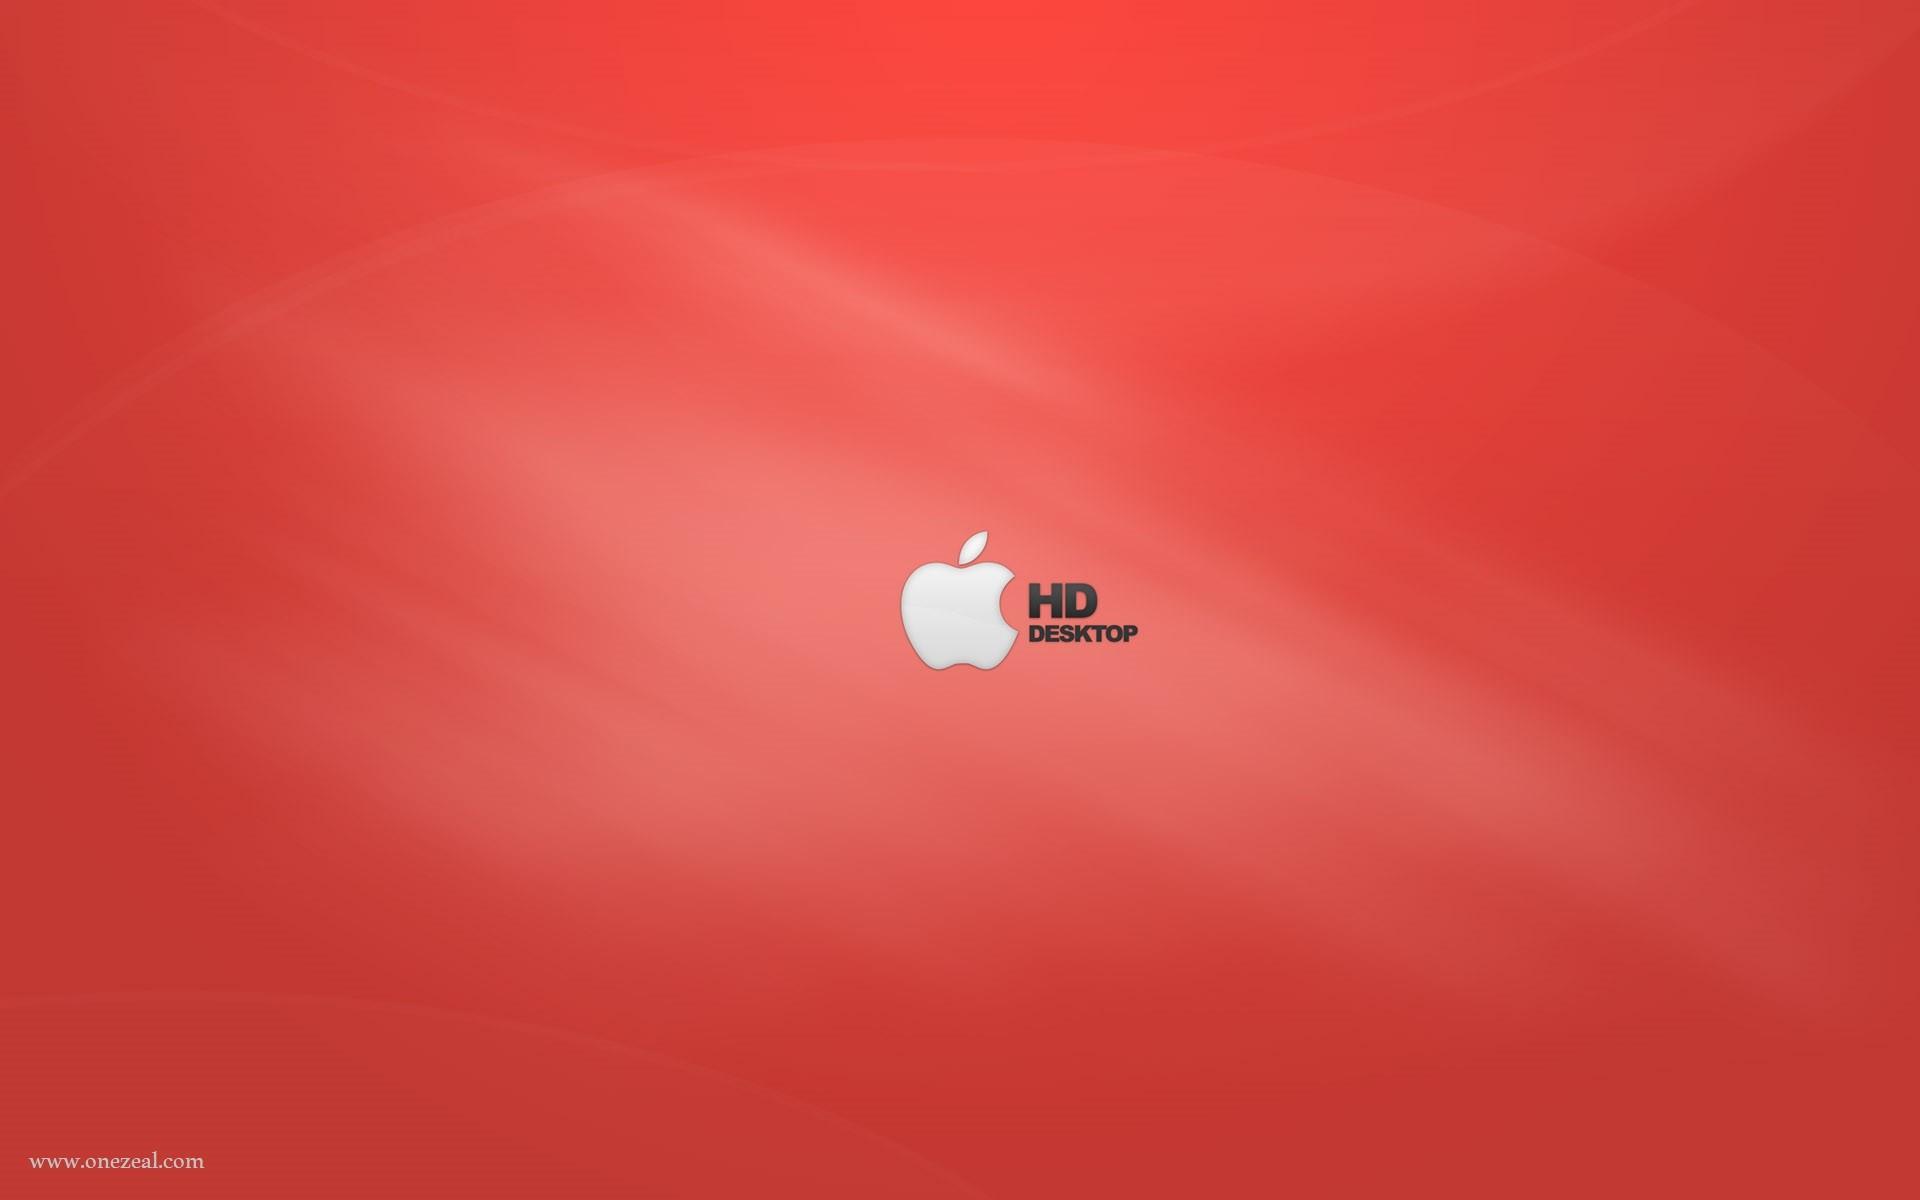 Red Apple Logo Wallpaper 64 Images